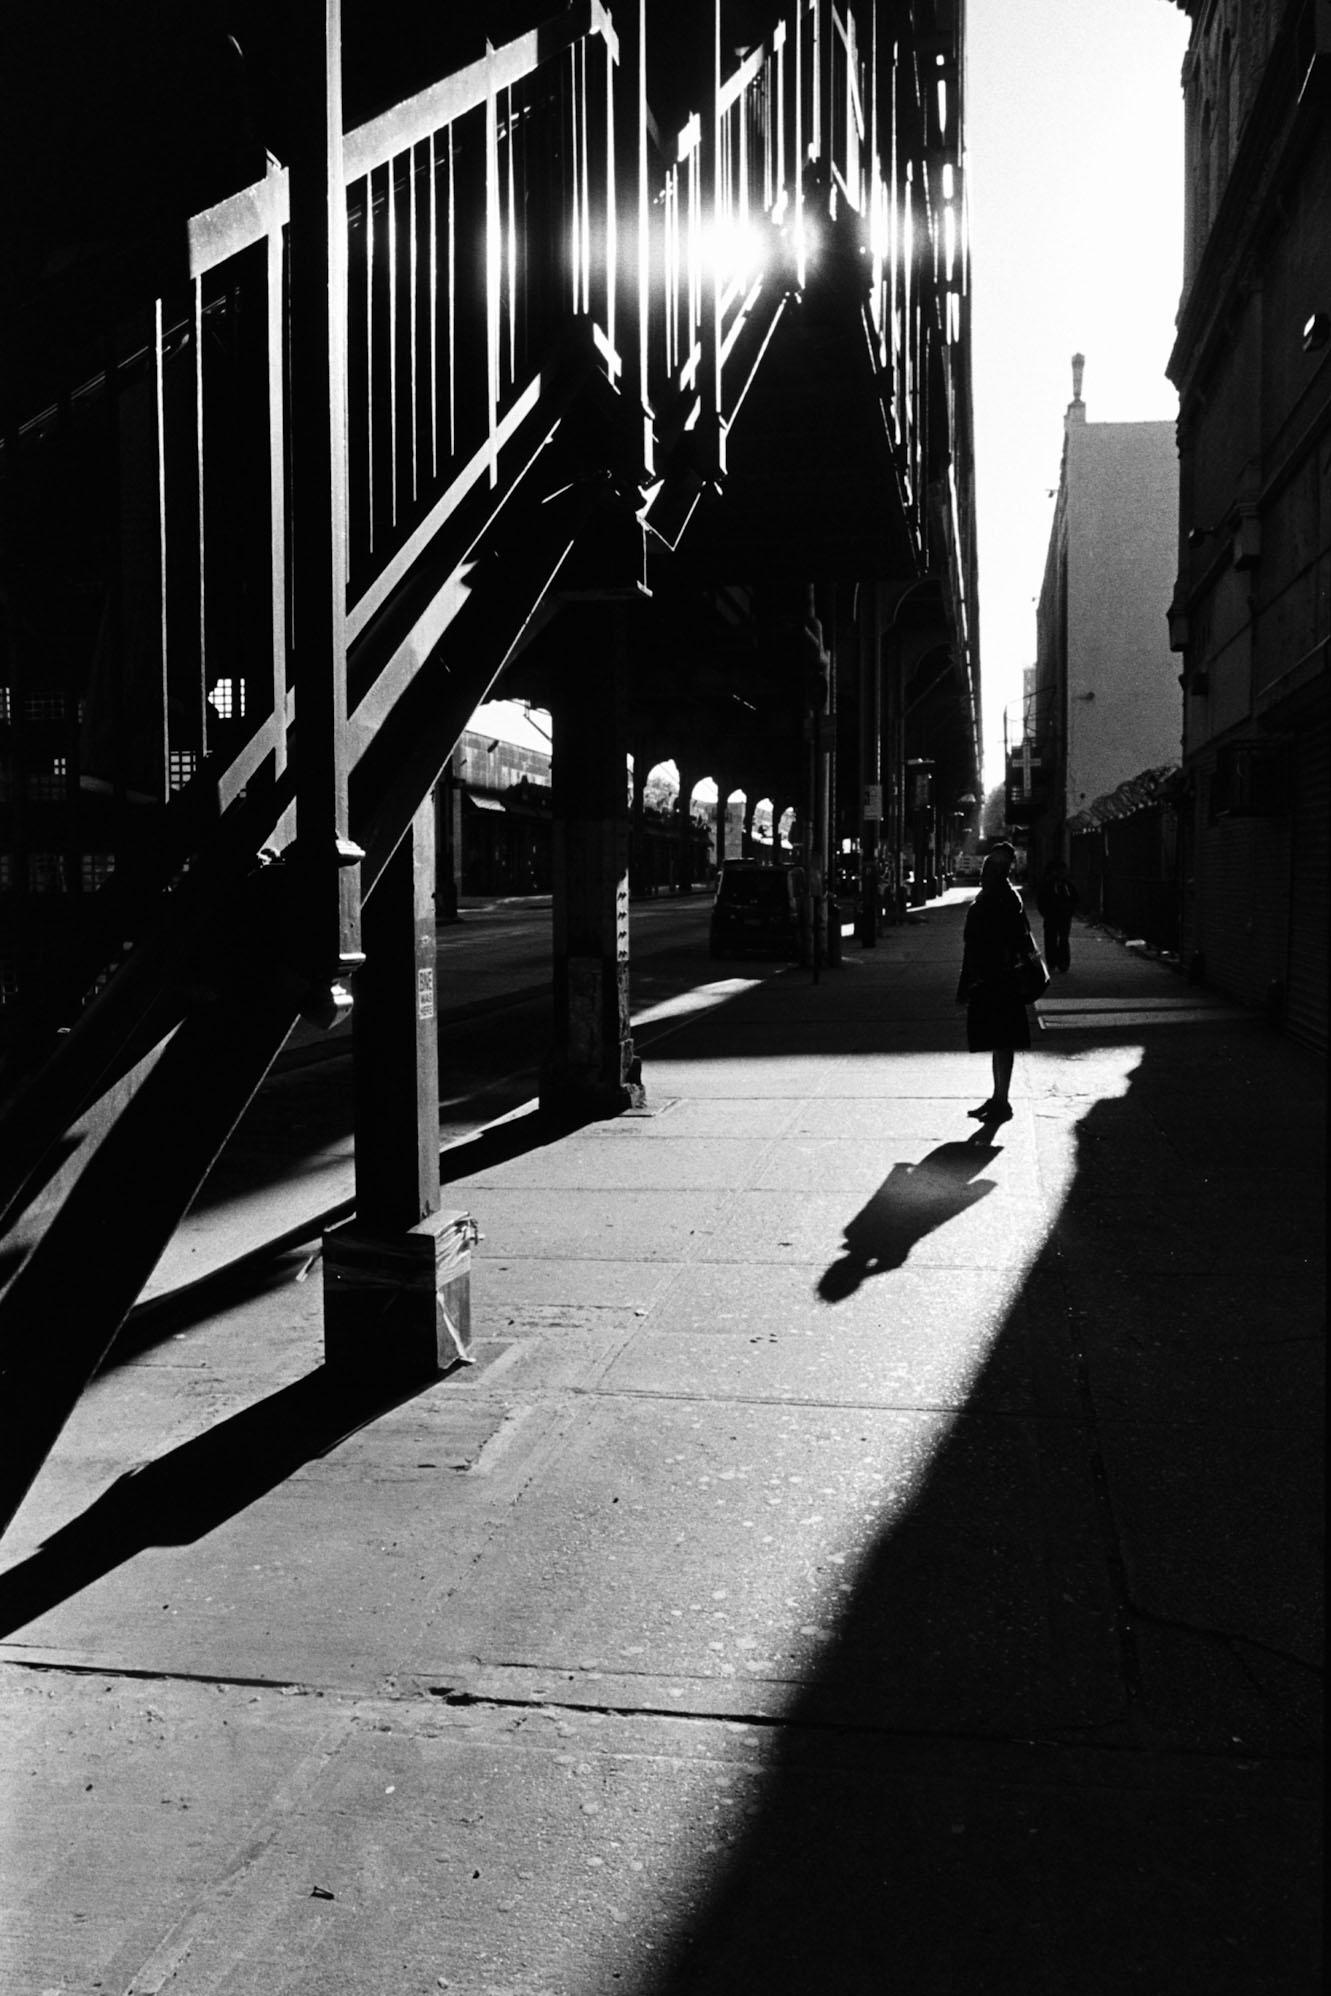 New-york-noir-cooper-ray-11